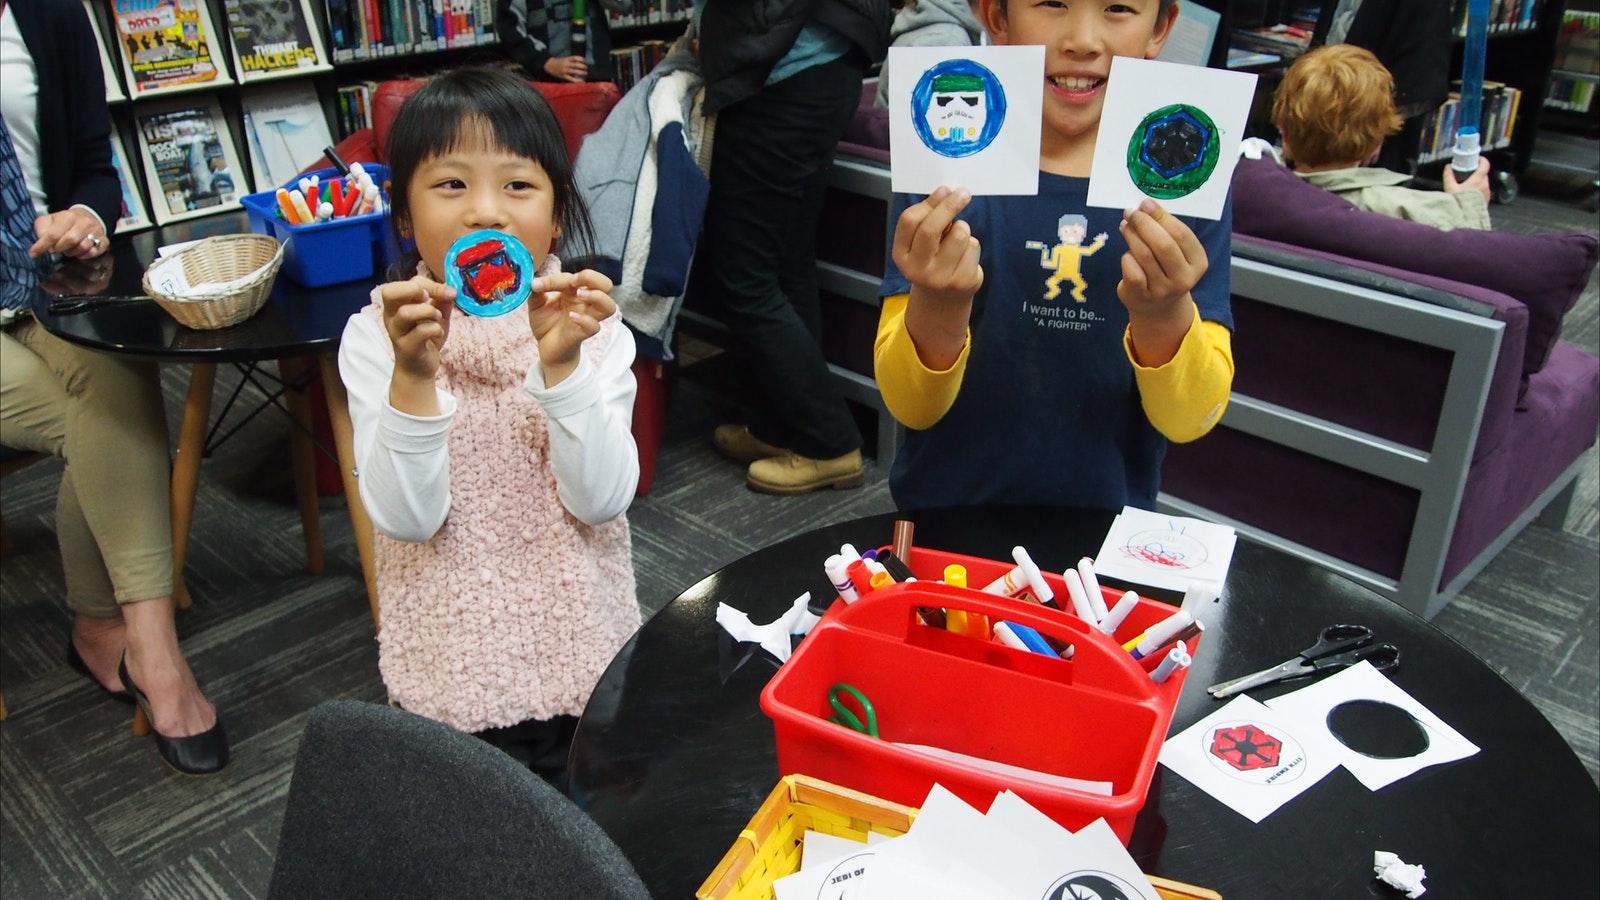 Childrens activity at Wodonga Library